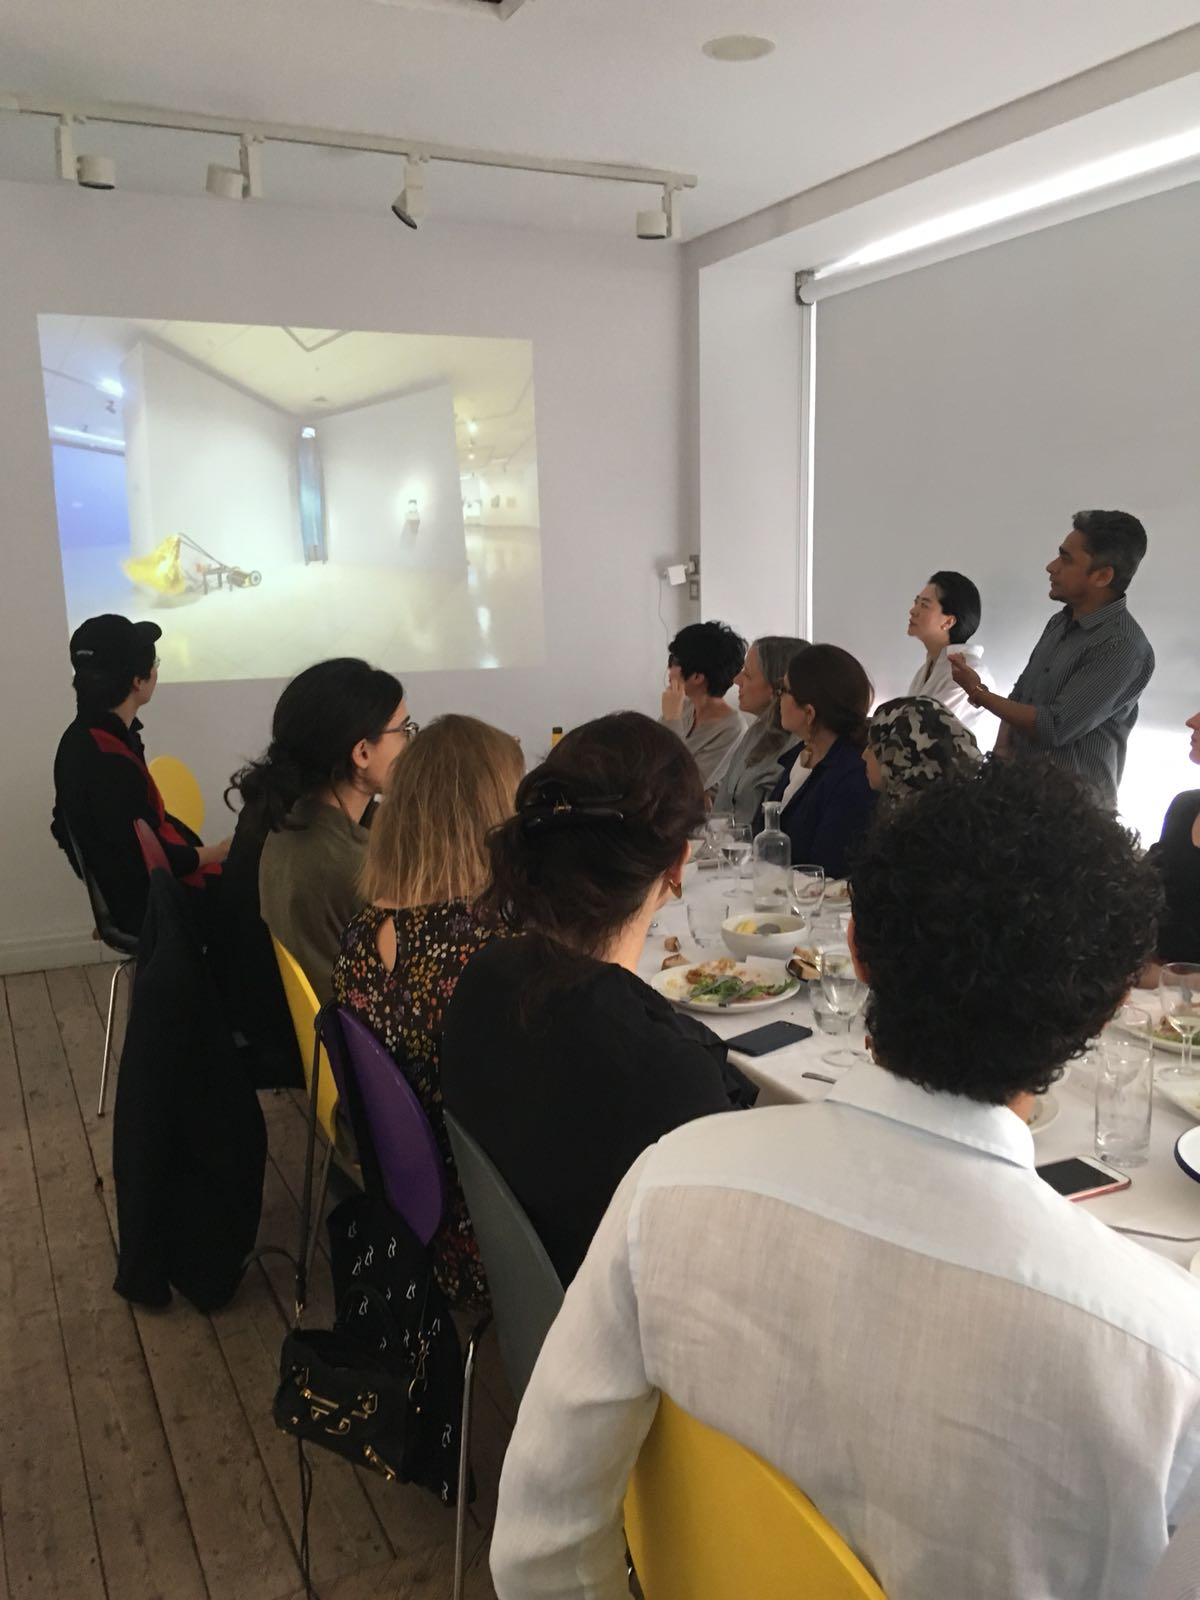 Mizanur Rahman Chowdhury giving a presentation on his work during a Delfina Foundation dinner. Image courtesy of Chowdhury.